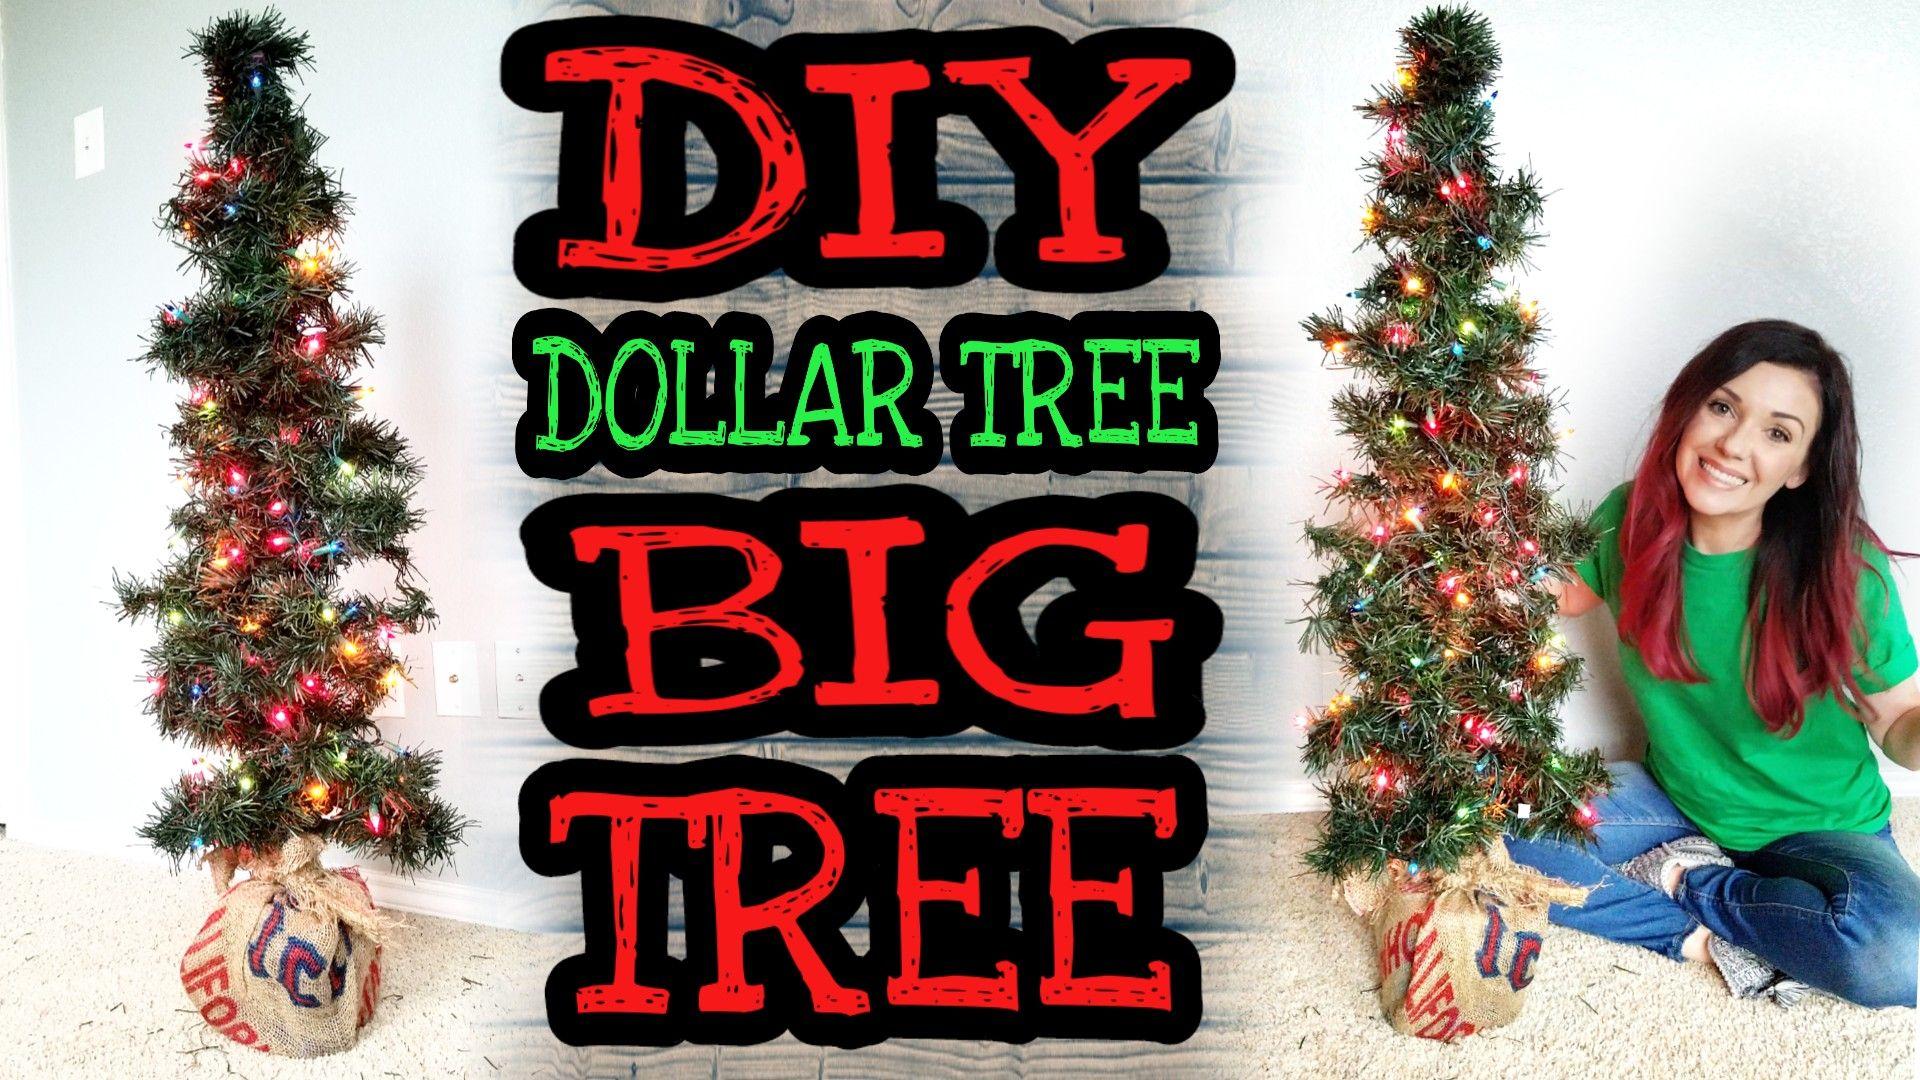 Diy Christmas Dollar Tree Decor Only 7 Or Less Diy Christmas Tree 4ft Tall Super Easy Super Ch Diy Dollar Tree Decor Skinny Christmas Tree Dollar Tree Diy